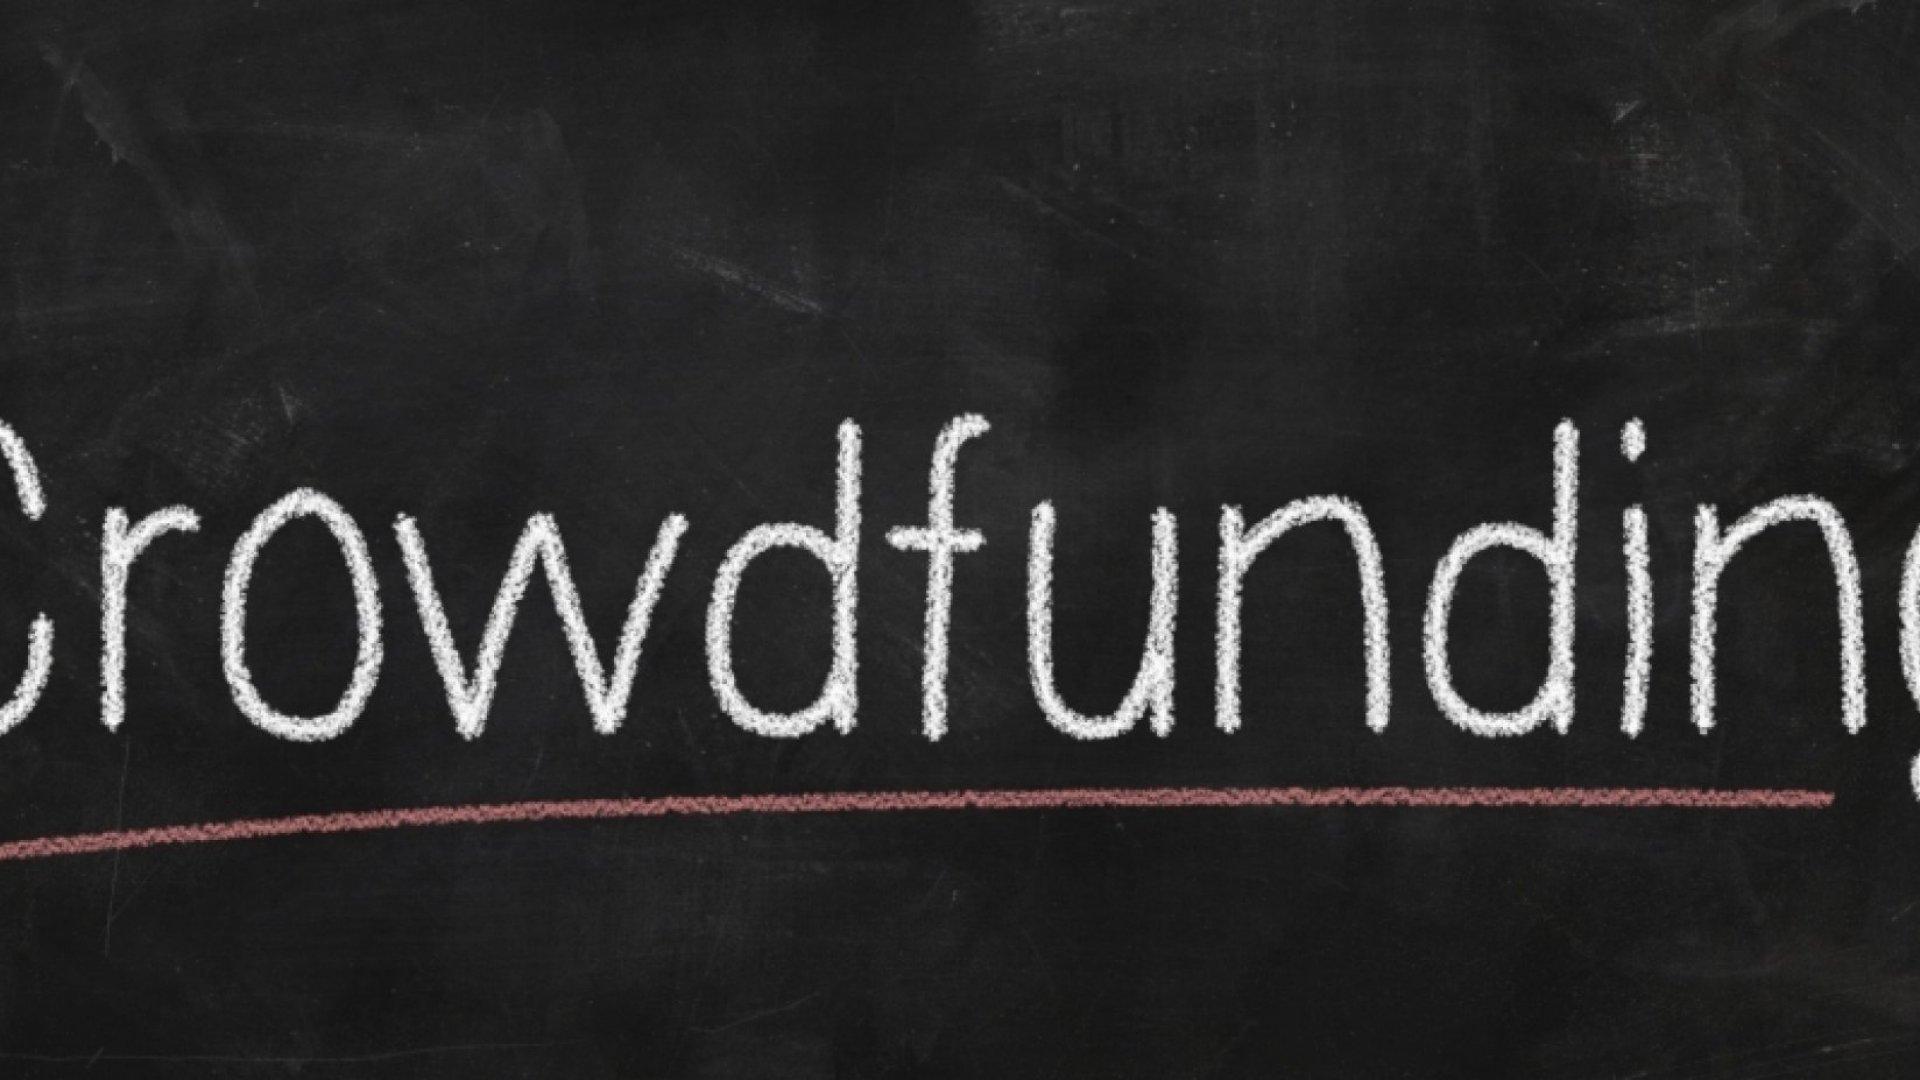 3 Surefire Ways to Prepare a Successful Kickstarter Campaign